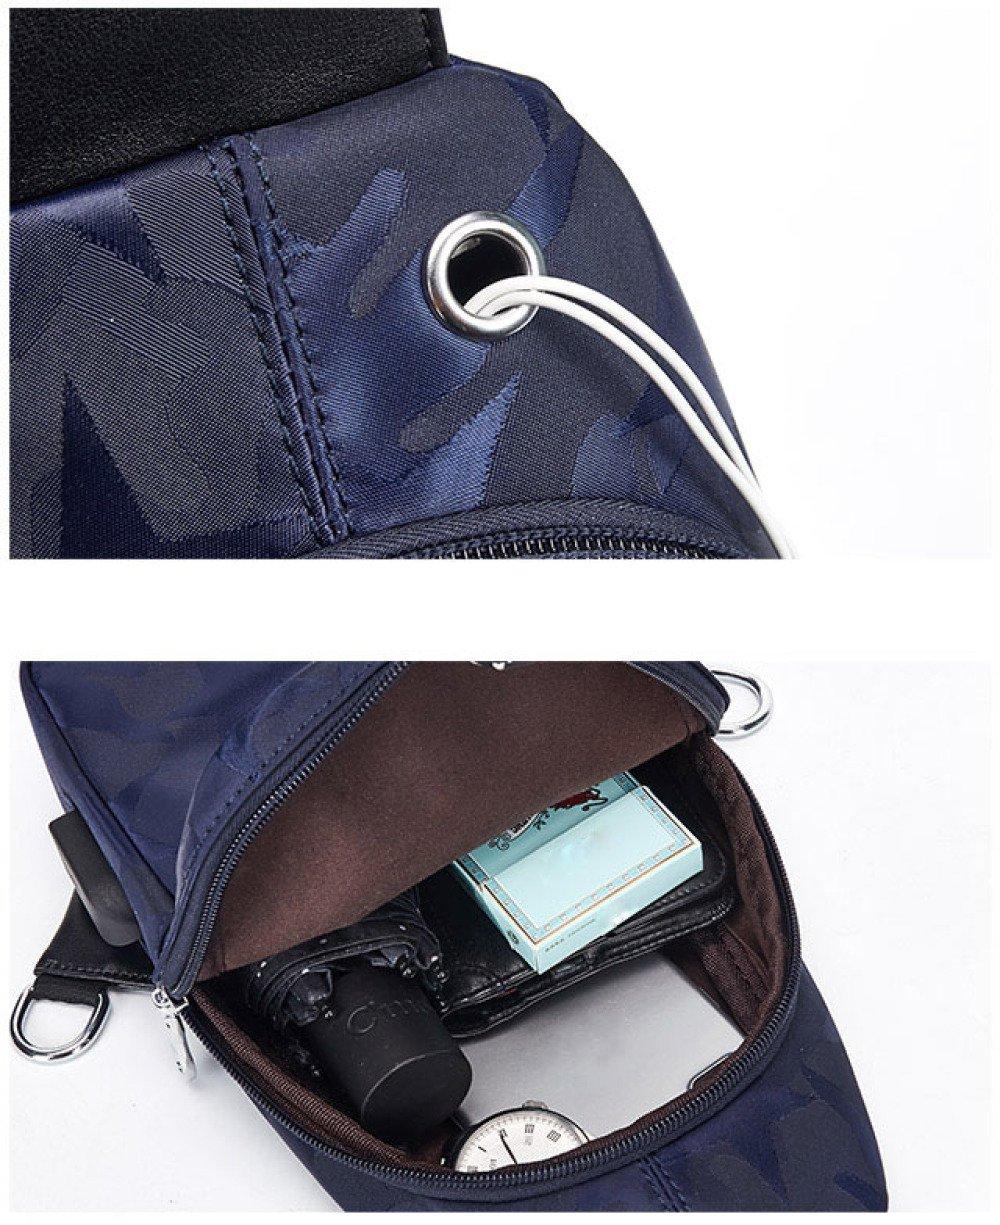 BAAFG Mens Backpack Bag Chest Pack For Outdoor,Black-OneSize Multiple Storage Purpose Shoulder Bag Carry Styles